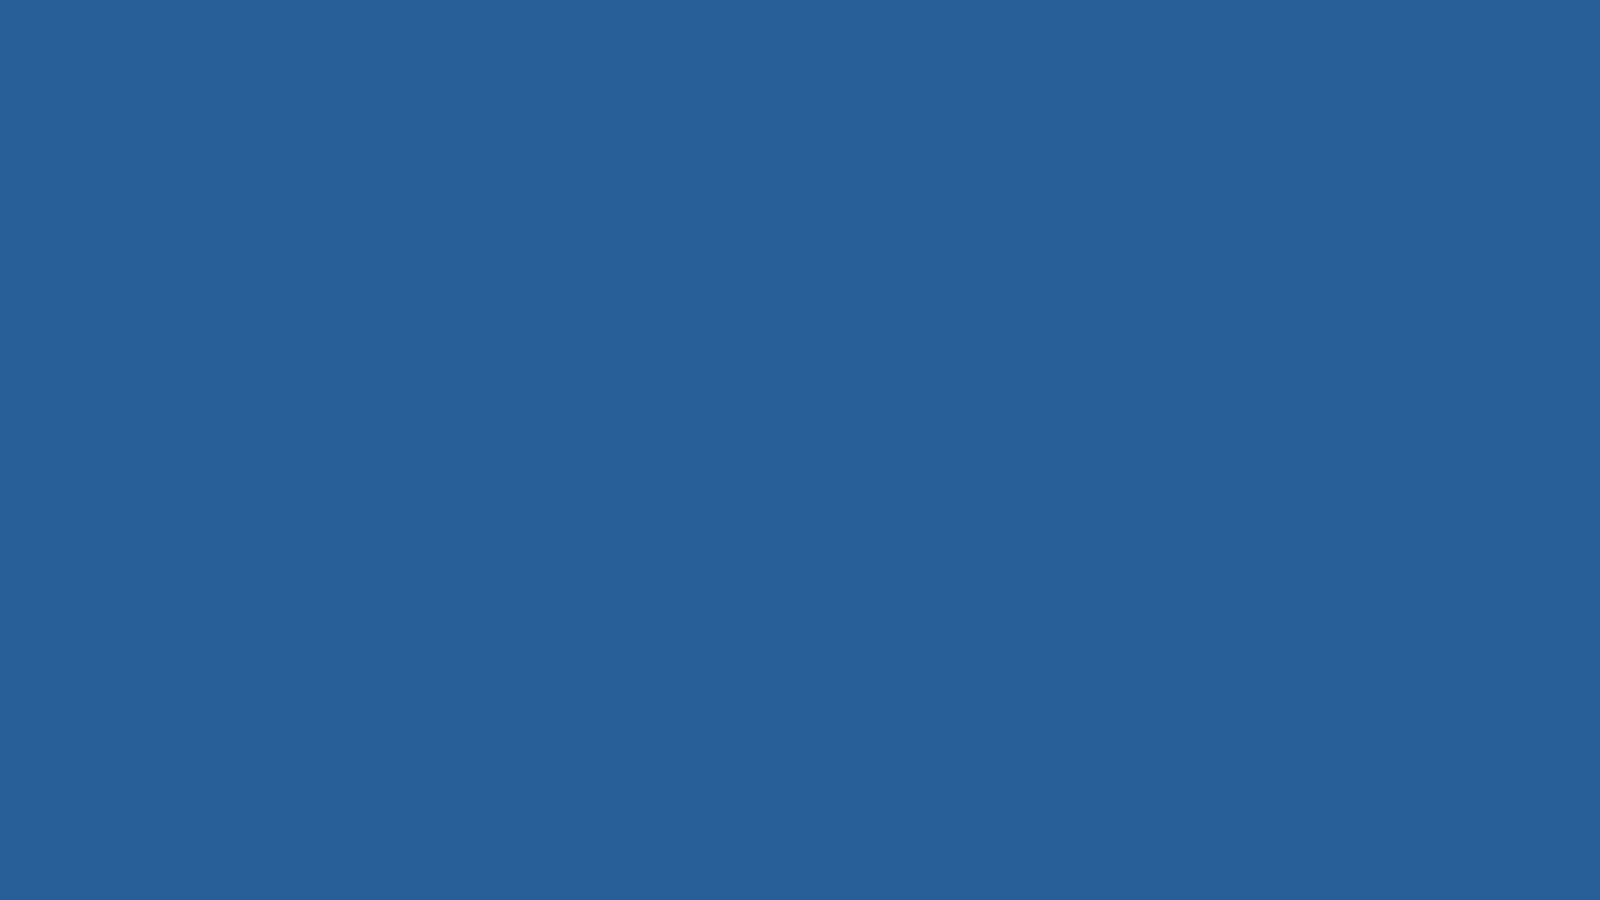 1600x900 Lapis Lazuli Solid Color Background